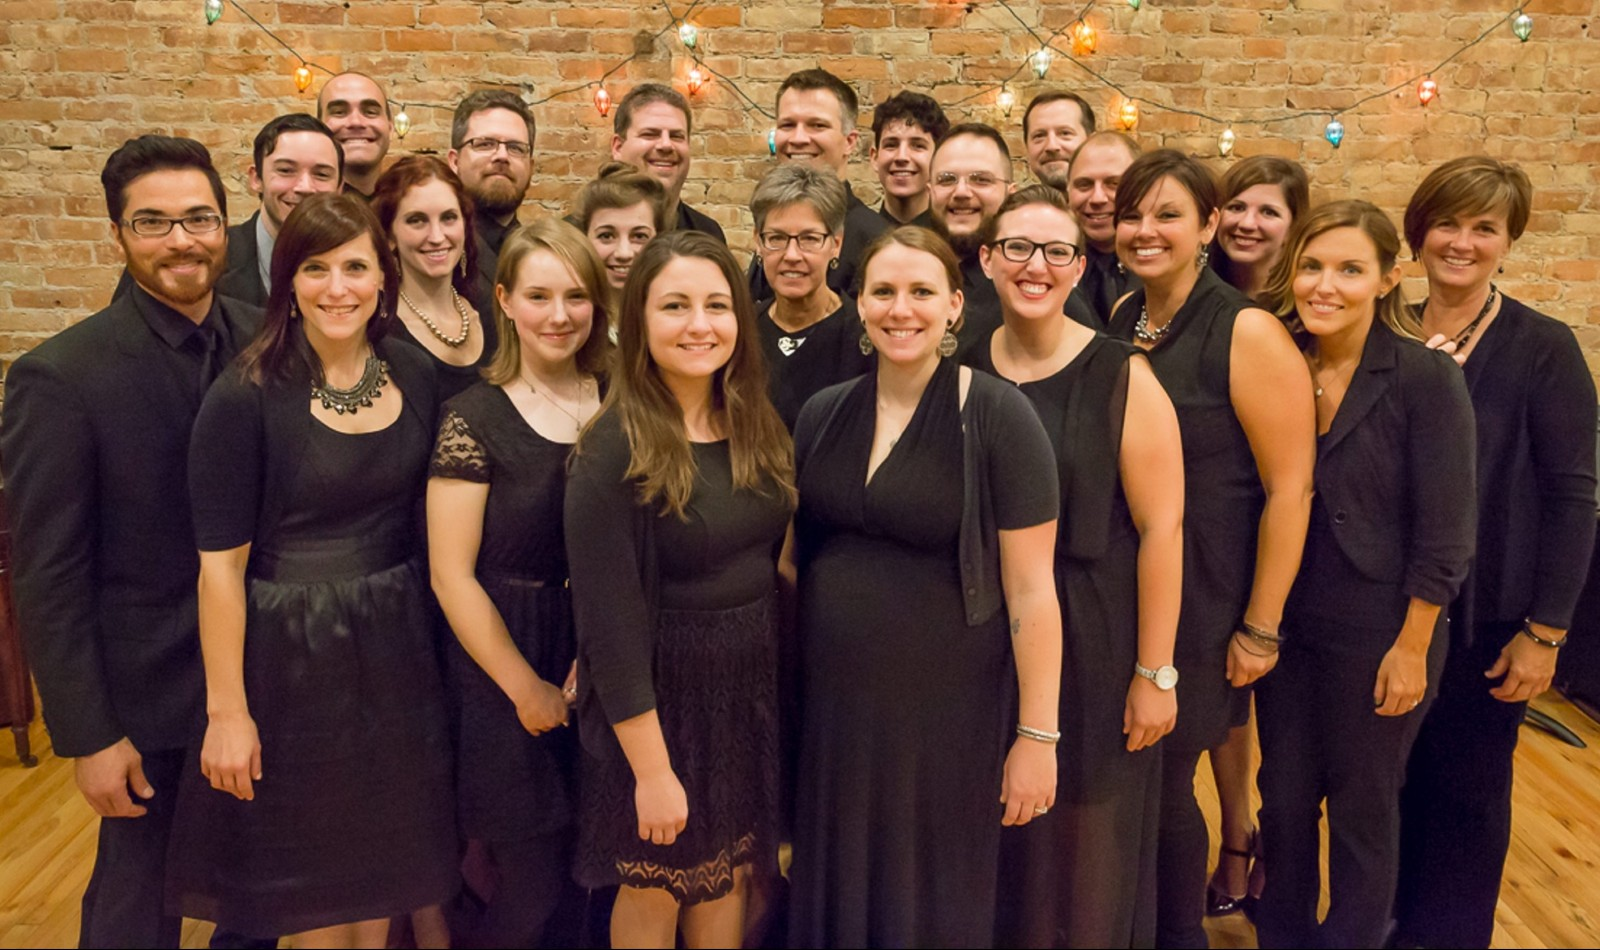 The Harmonia Chamber Singers will celebrate 10 years of singing May 21.